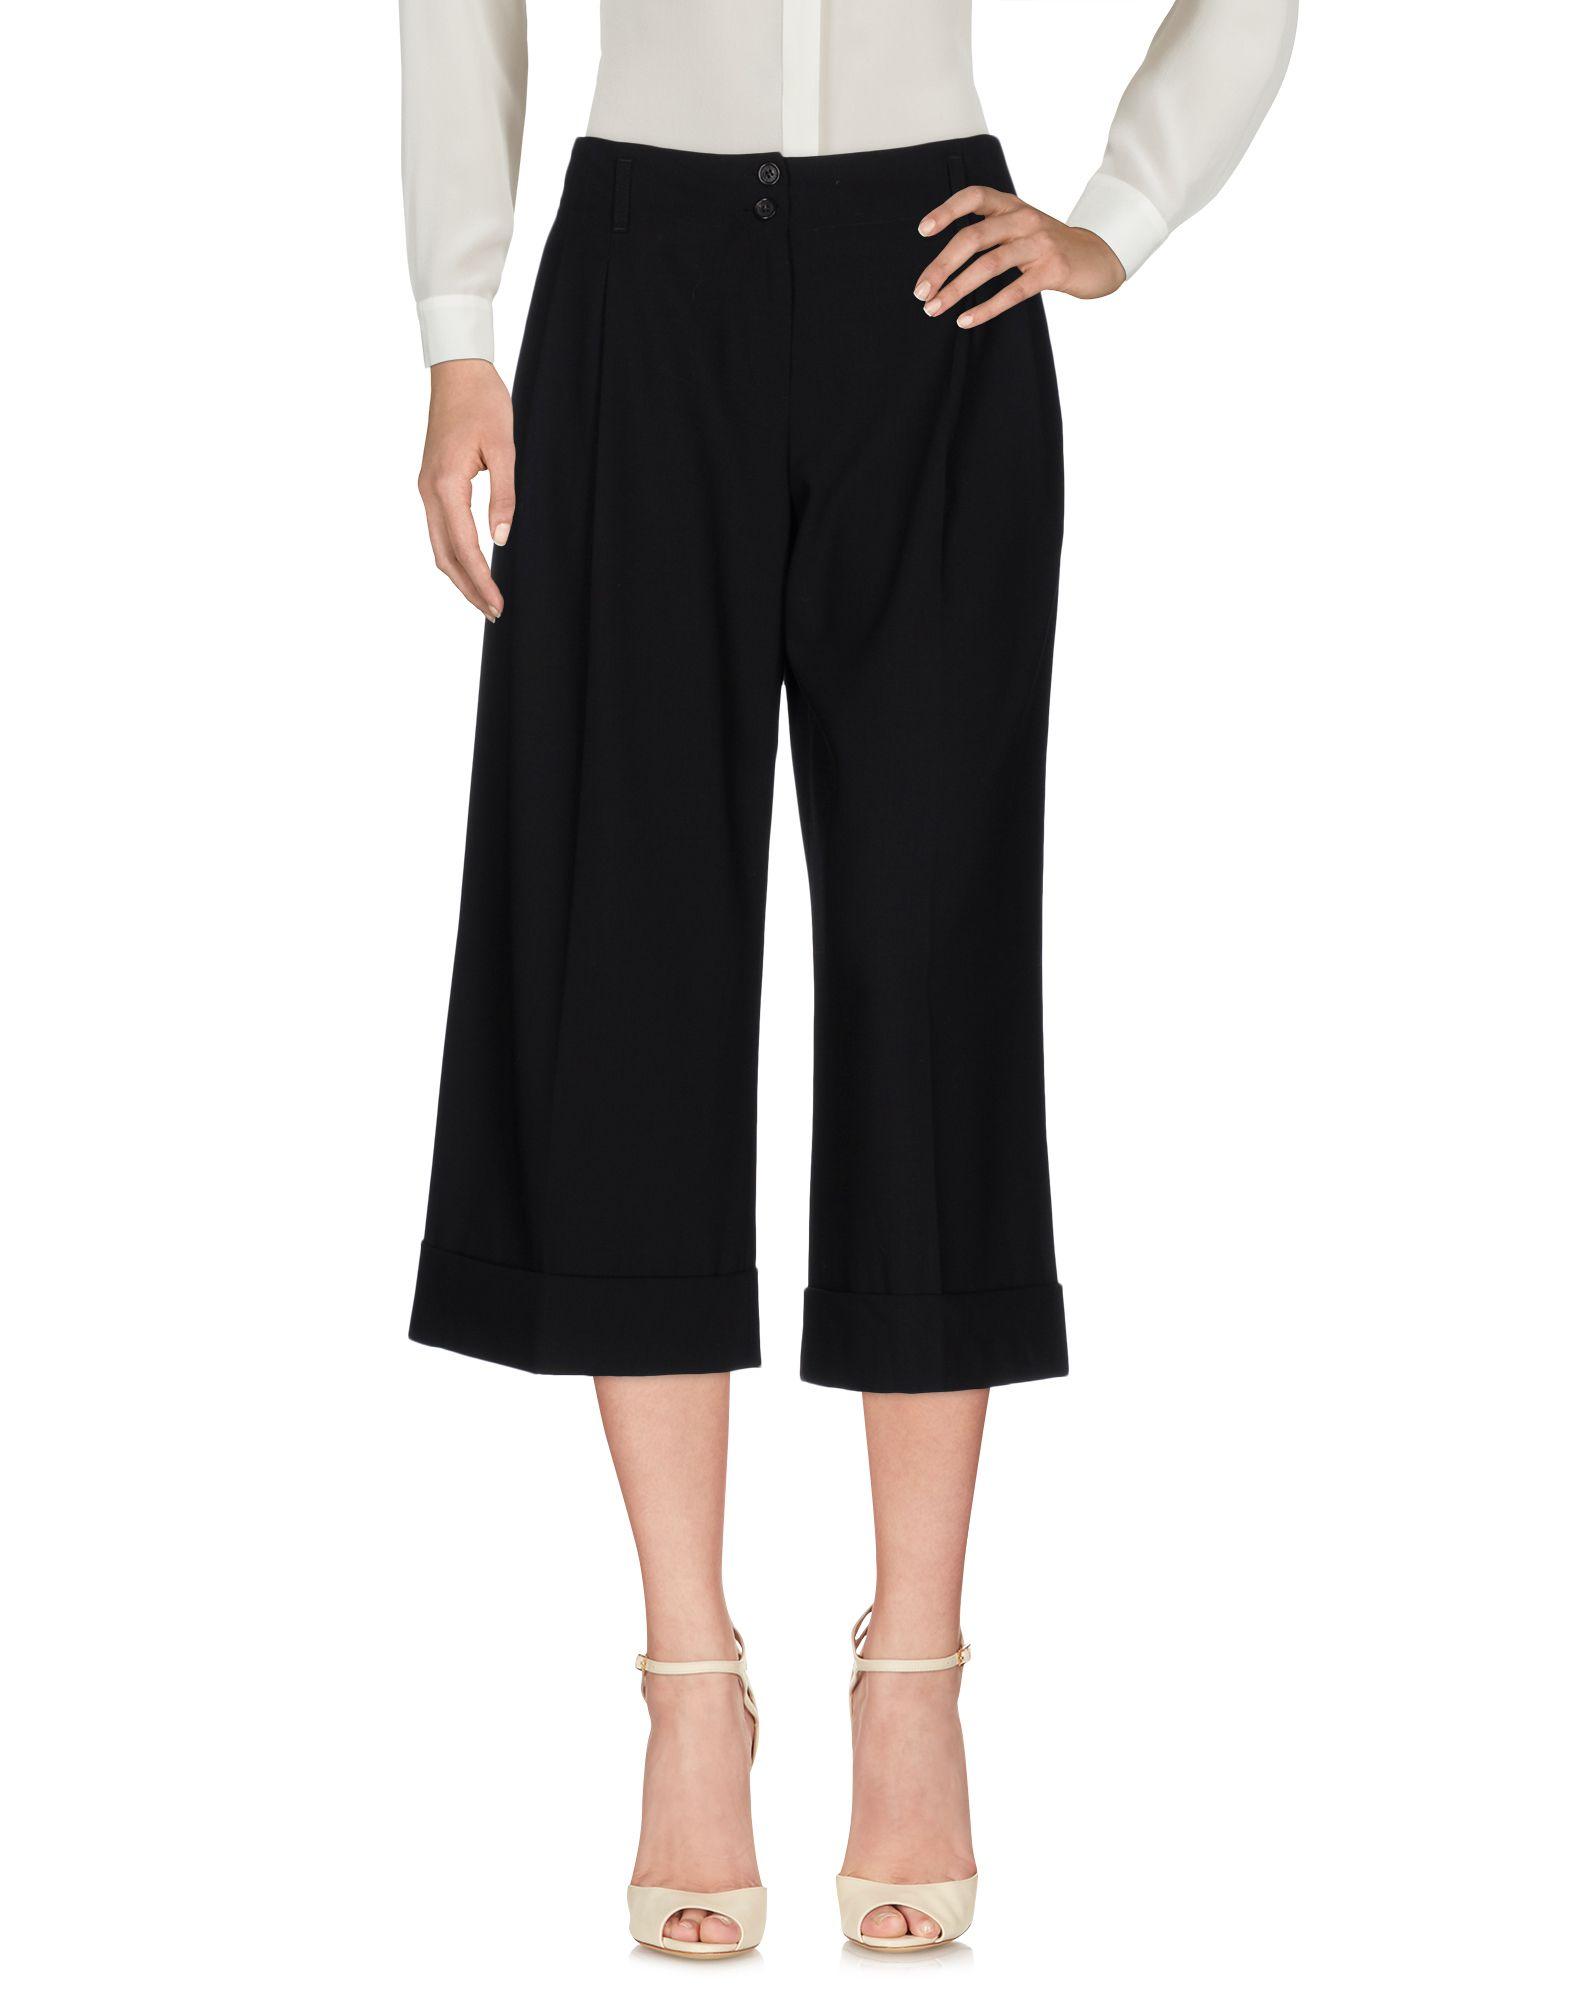 Pantalone Classico Michael Kors Donna - Acquista online su MvvO4gD